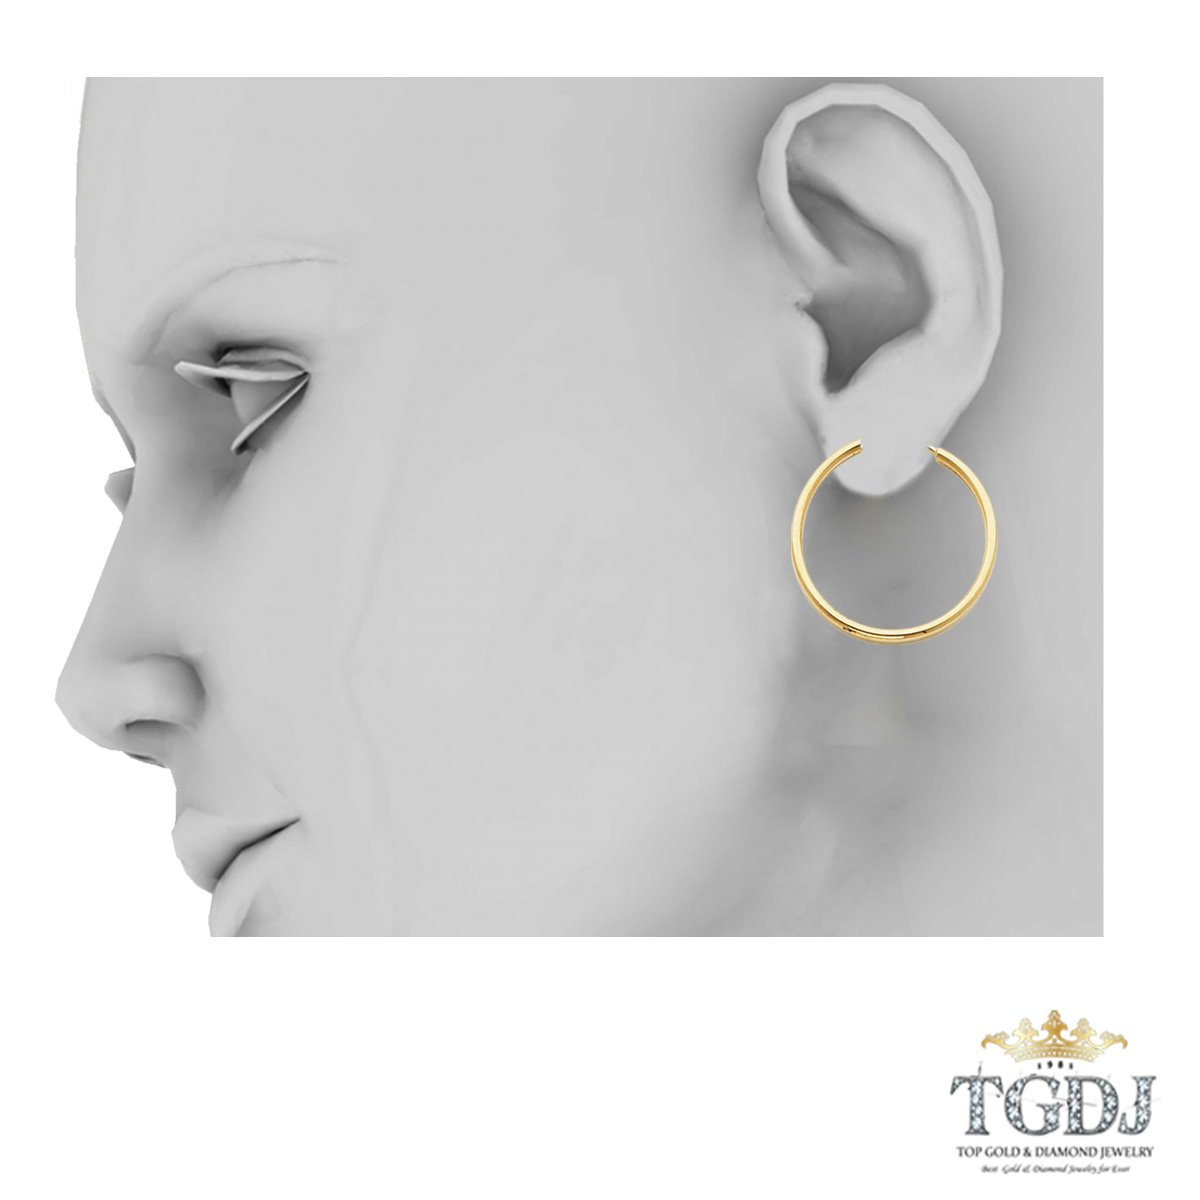 Diameter 20mm 14K Yellow Gold 2MM Thickness Hinged Hoop Earrings